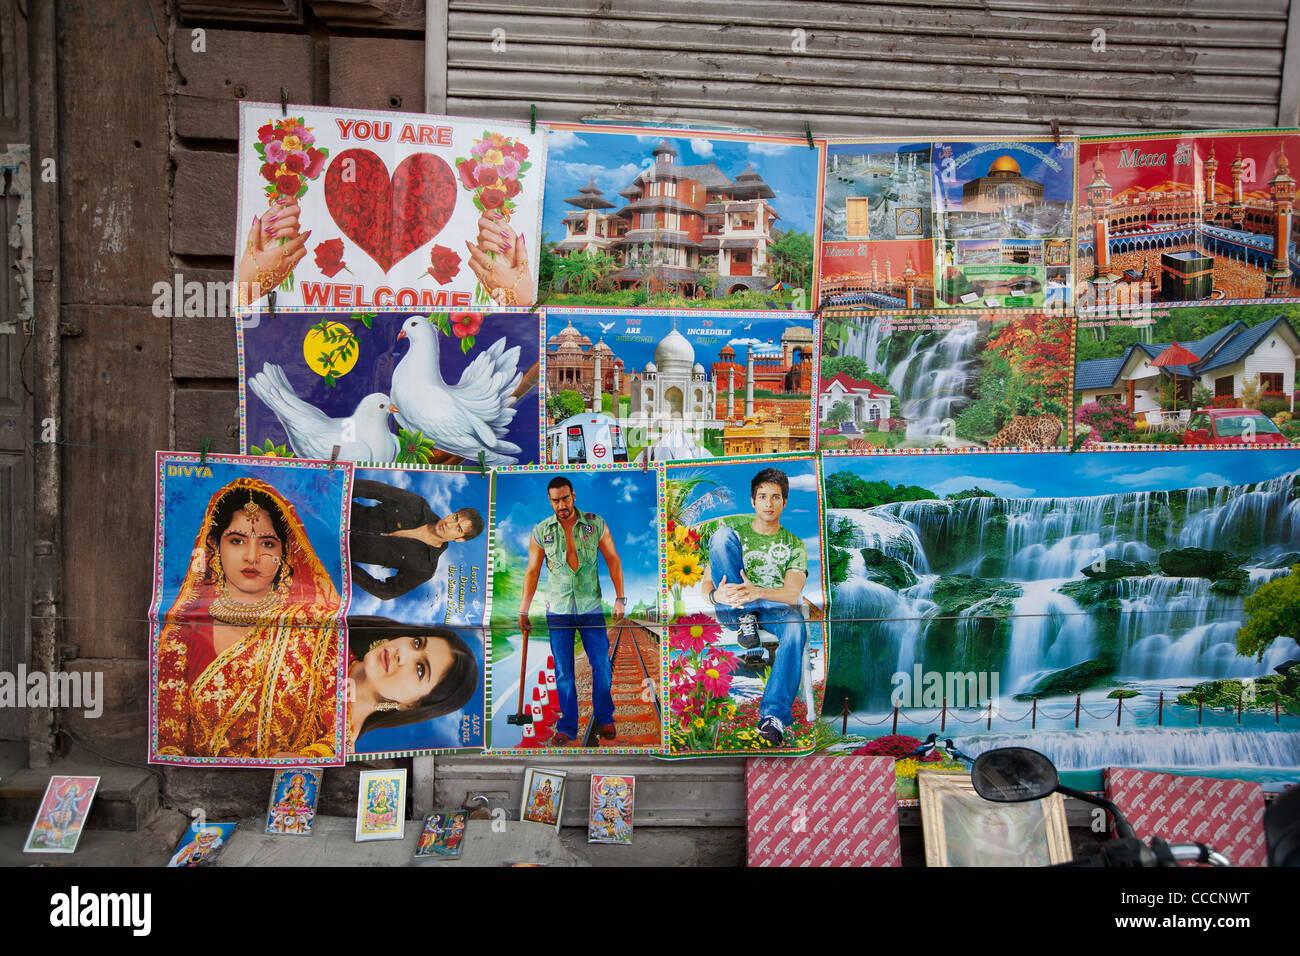 india marketplace stock photos india marketplace stock images alamy. Black Bedroom Furniture Sets. Home Design Ideas